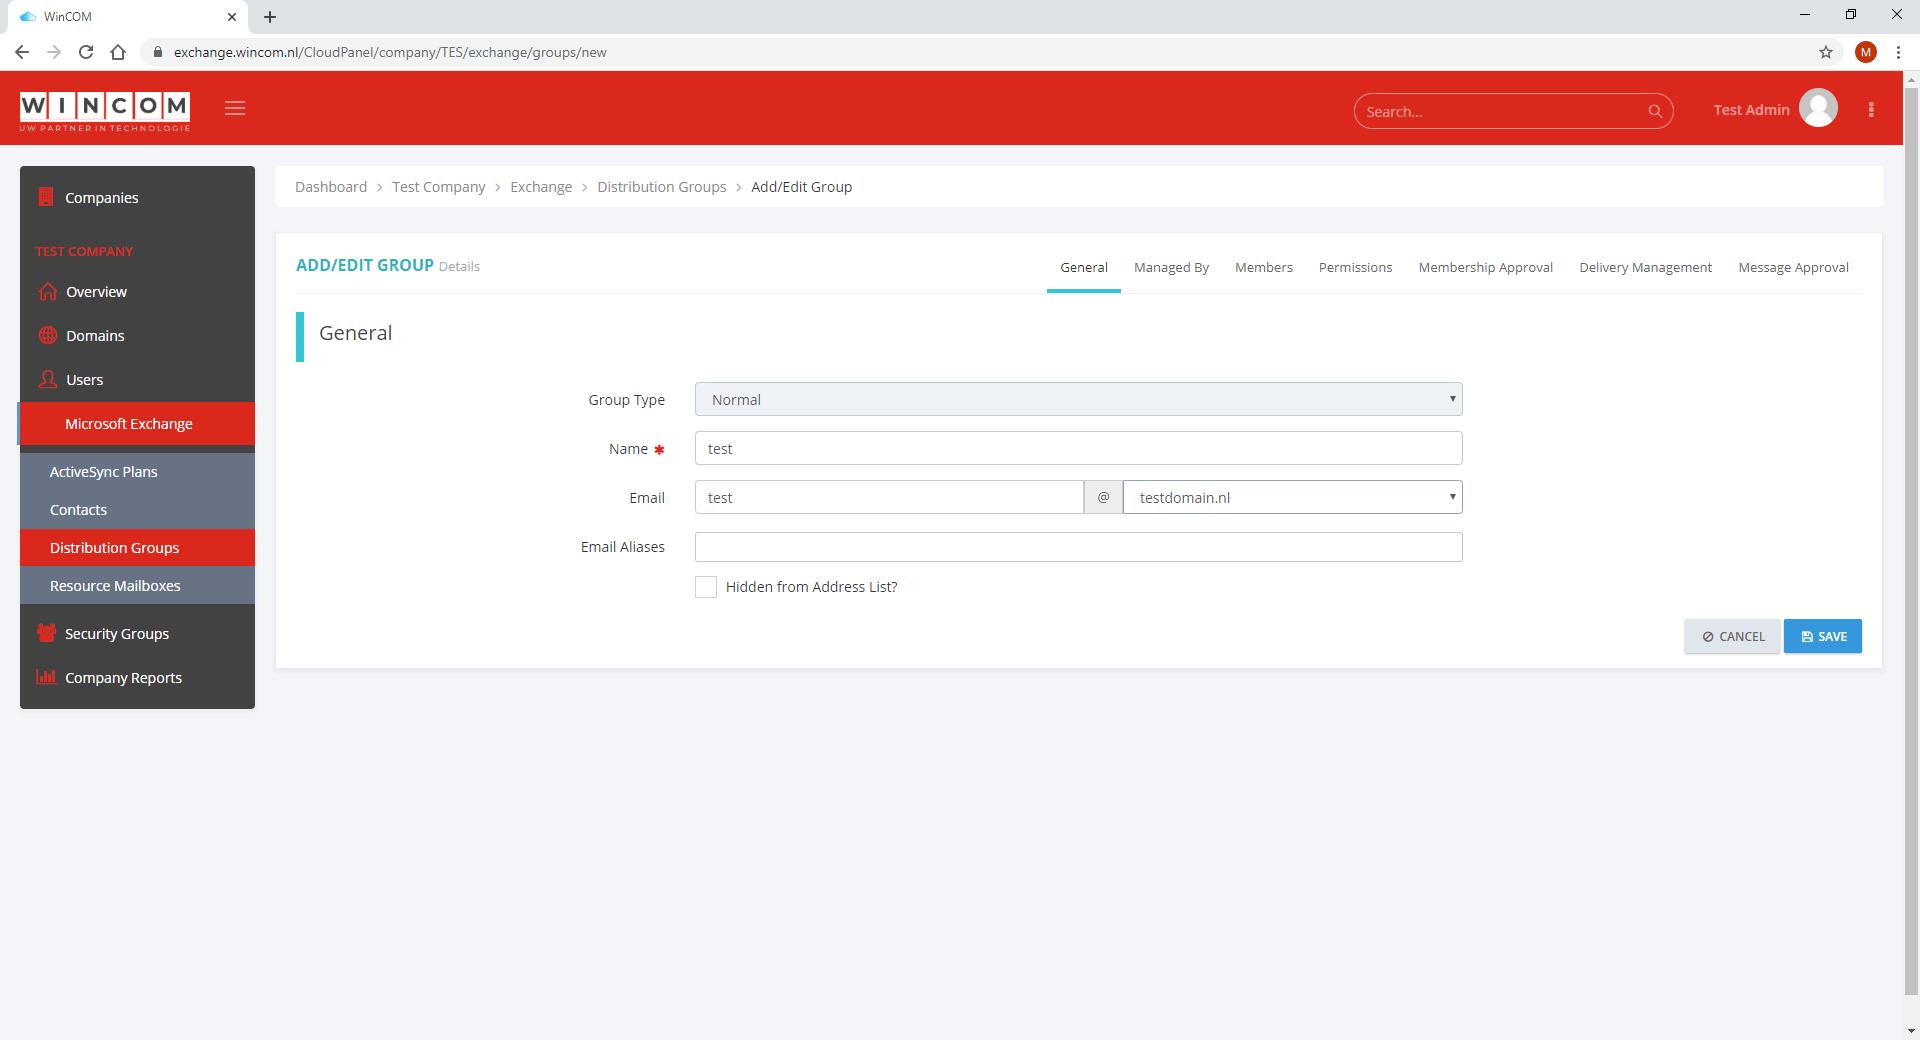 beheerpaneel basichost hosted exchange